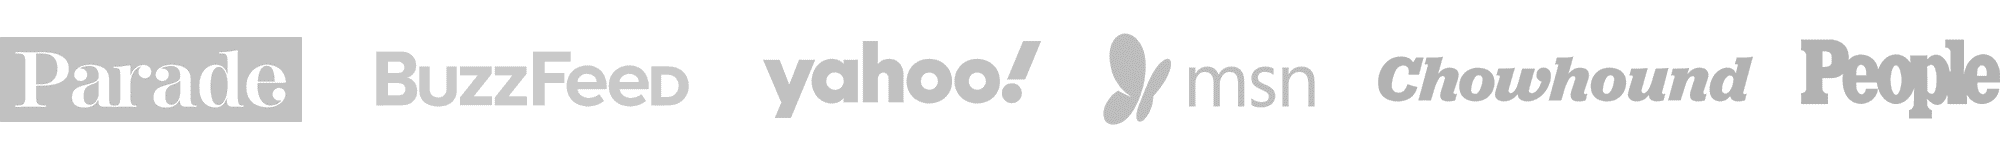 Logos: Parade, Buzzfeed, Yahoo, MSN, Chowhound, People